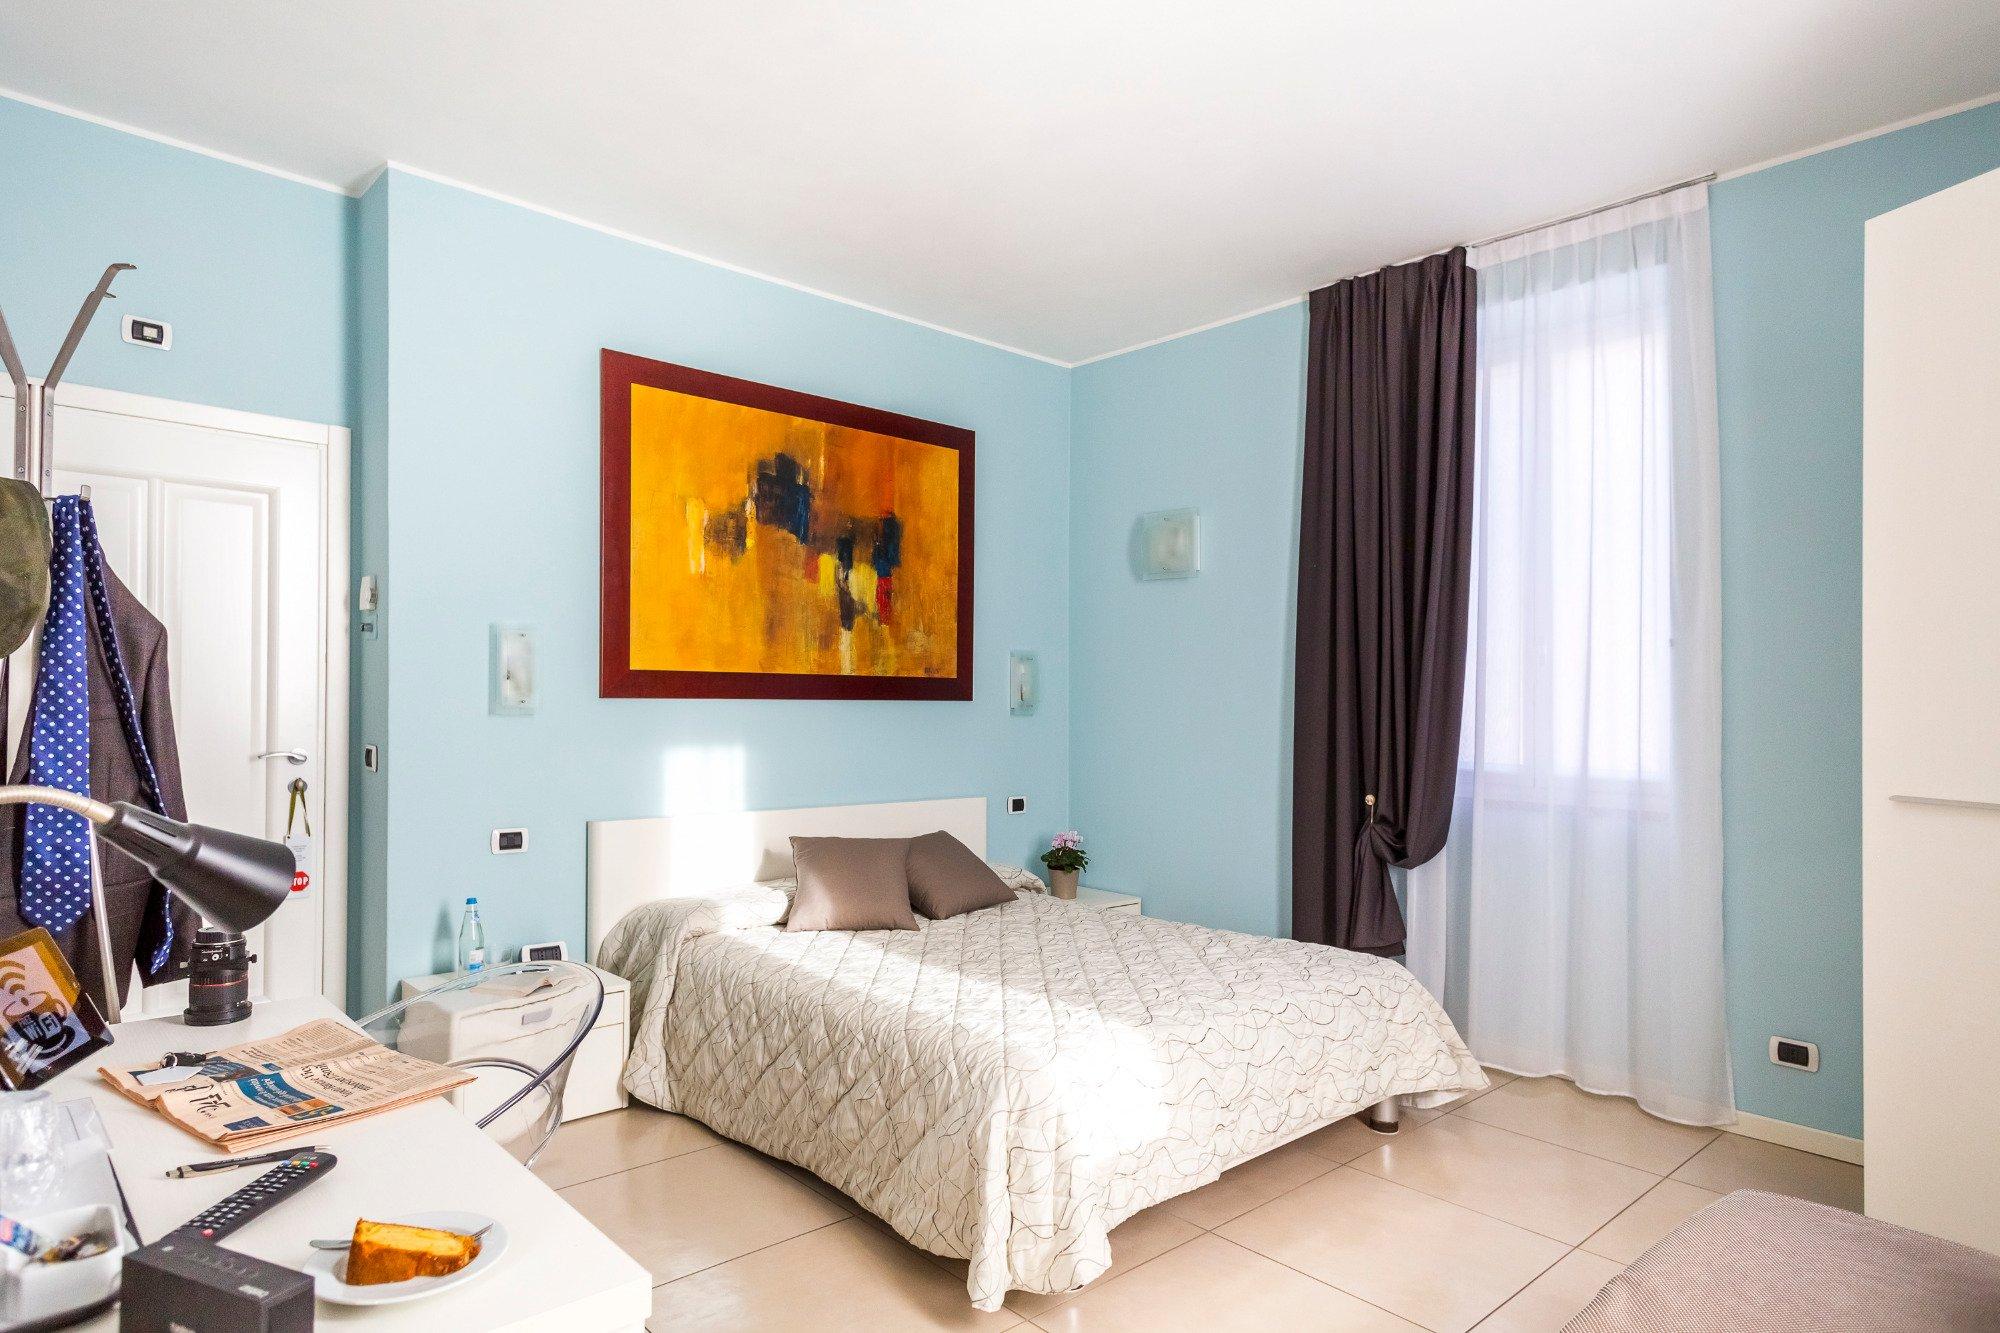 Polvara Trentuno Bed & Breakfast